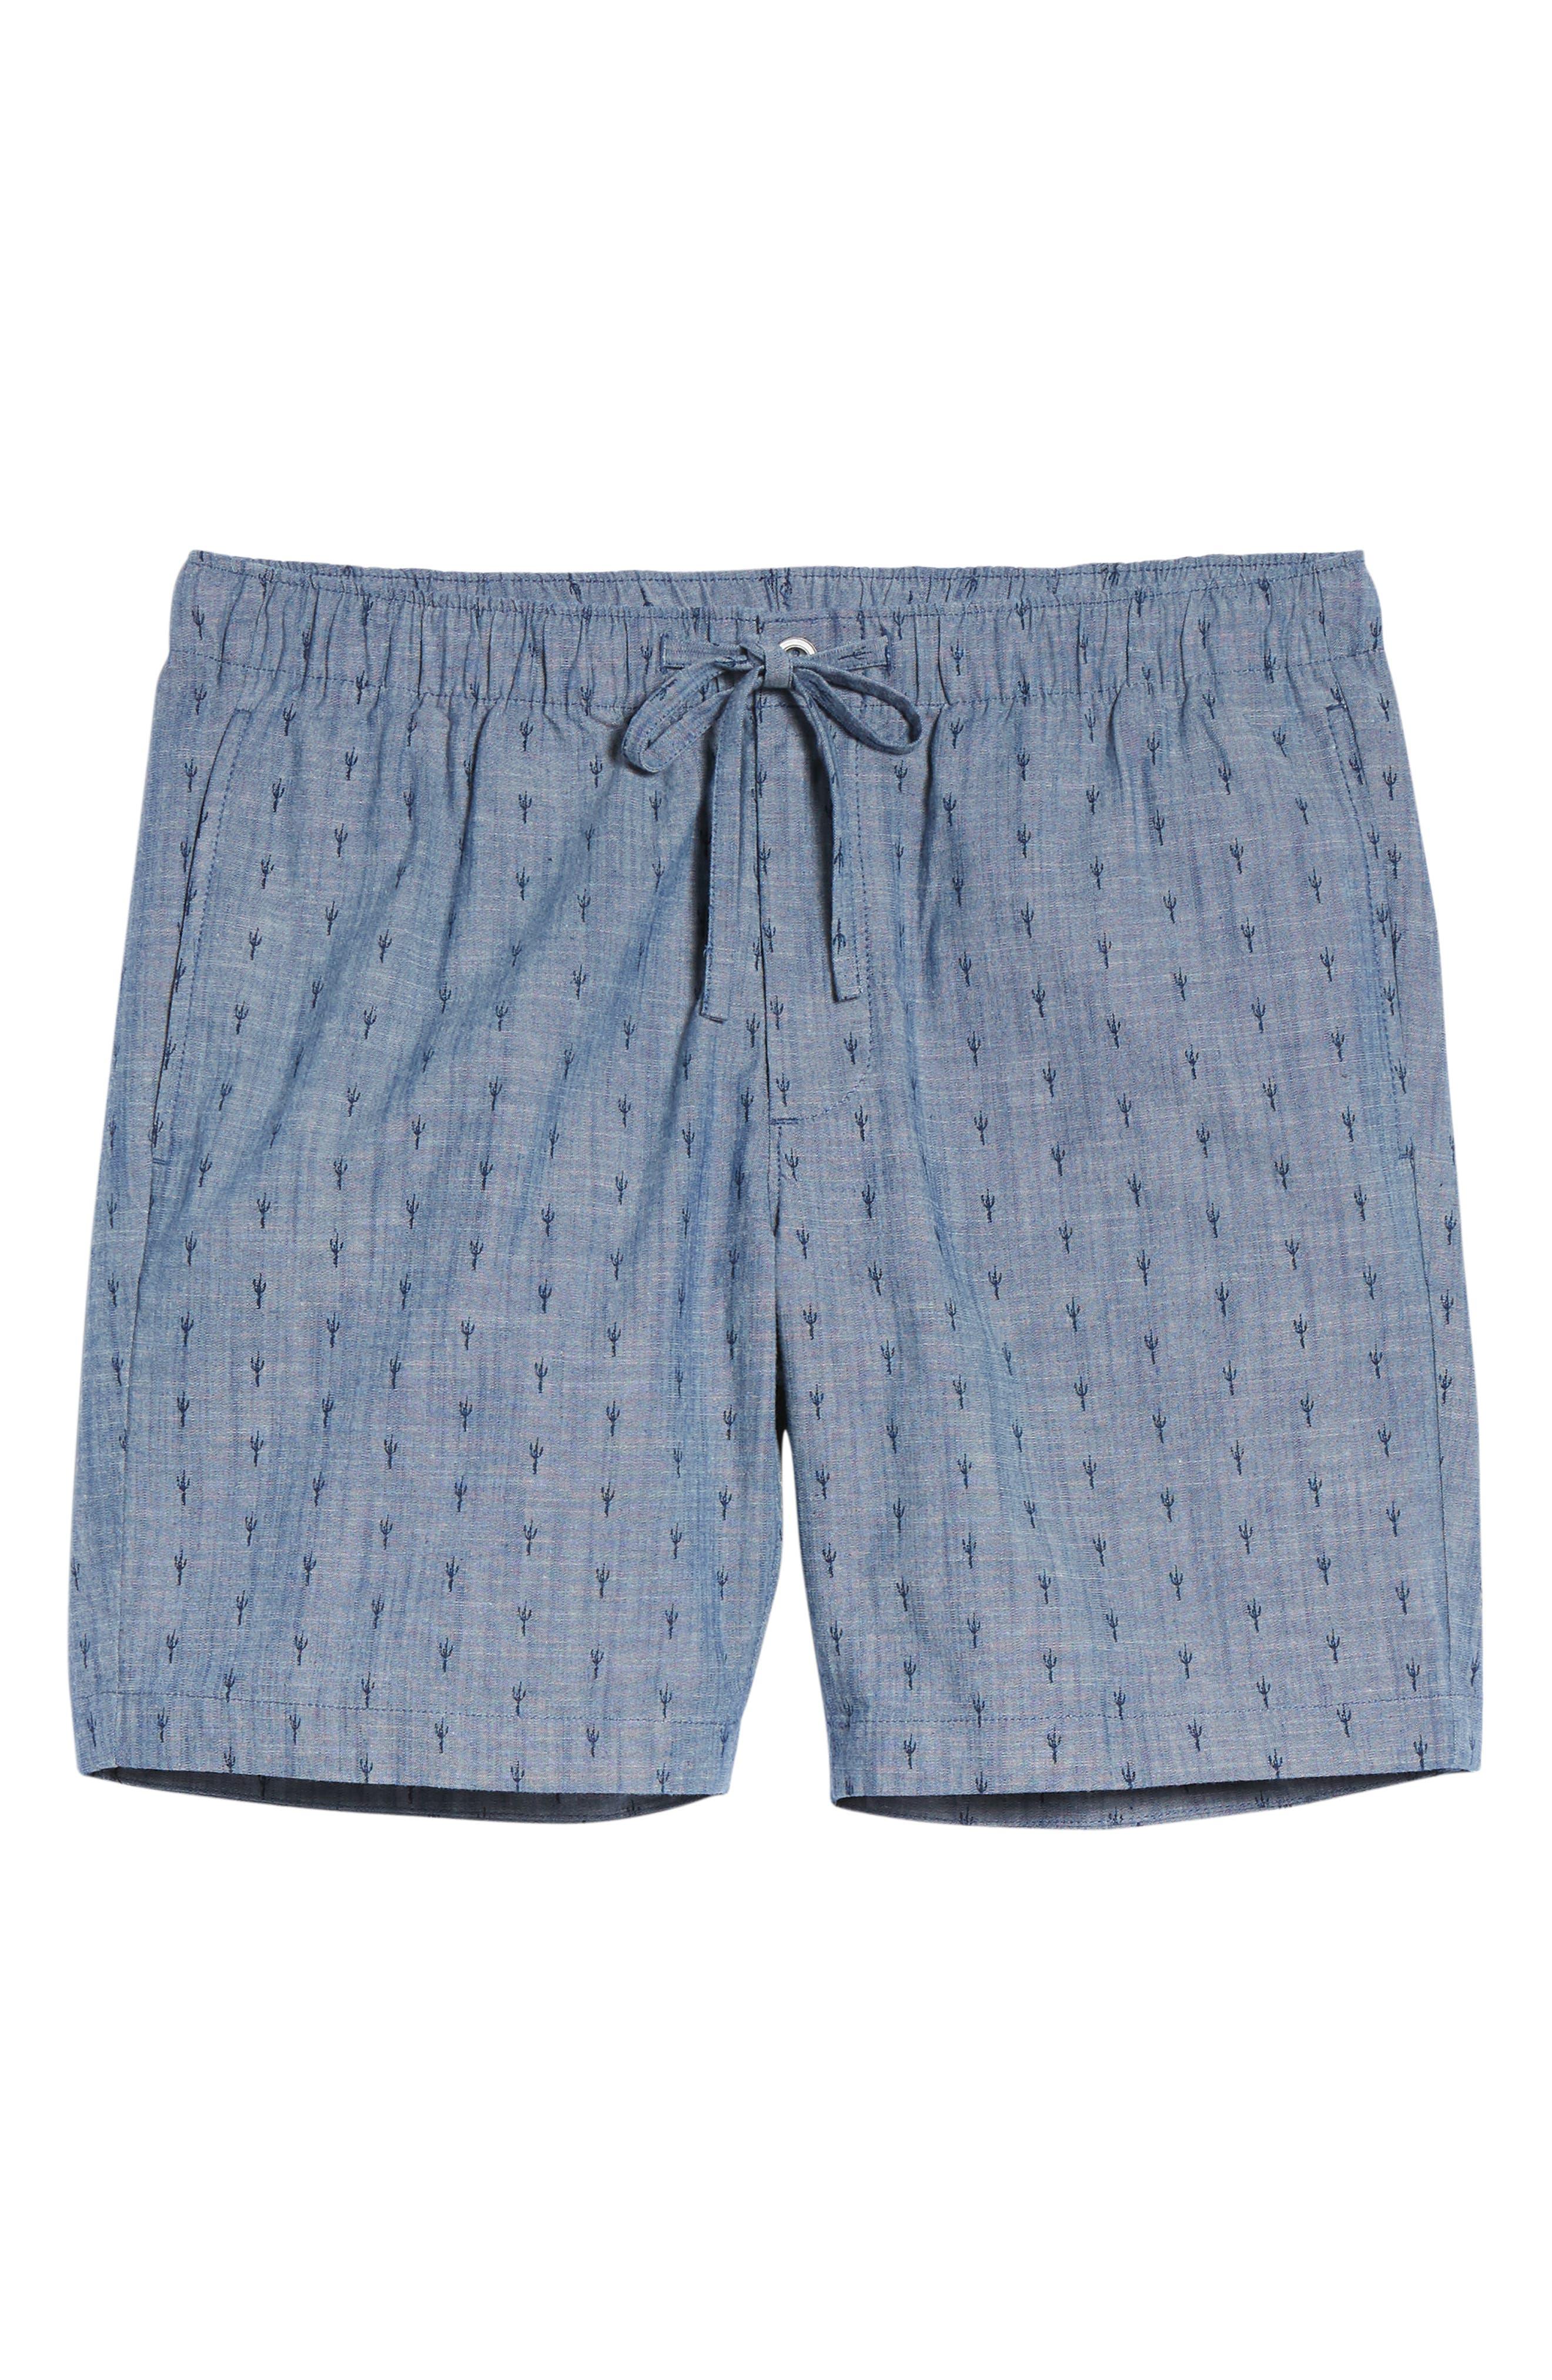 Slim Fit Print Beach Shorts,                             Alternate thumbnail 6, color,                             Cacti Stamp